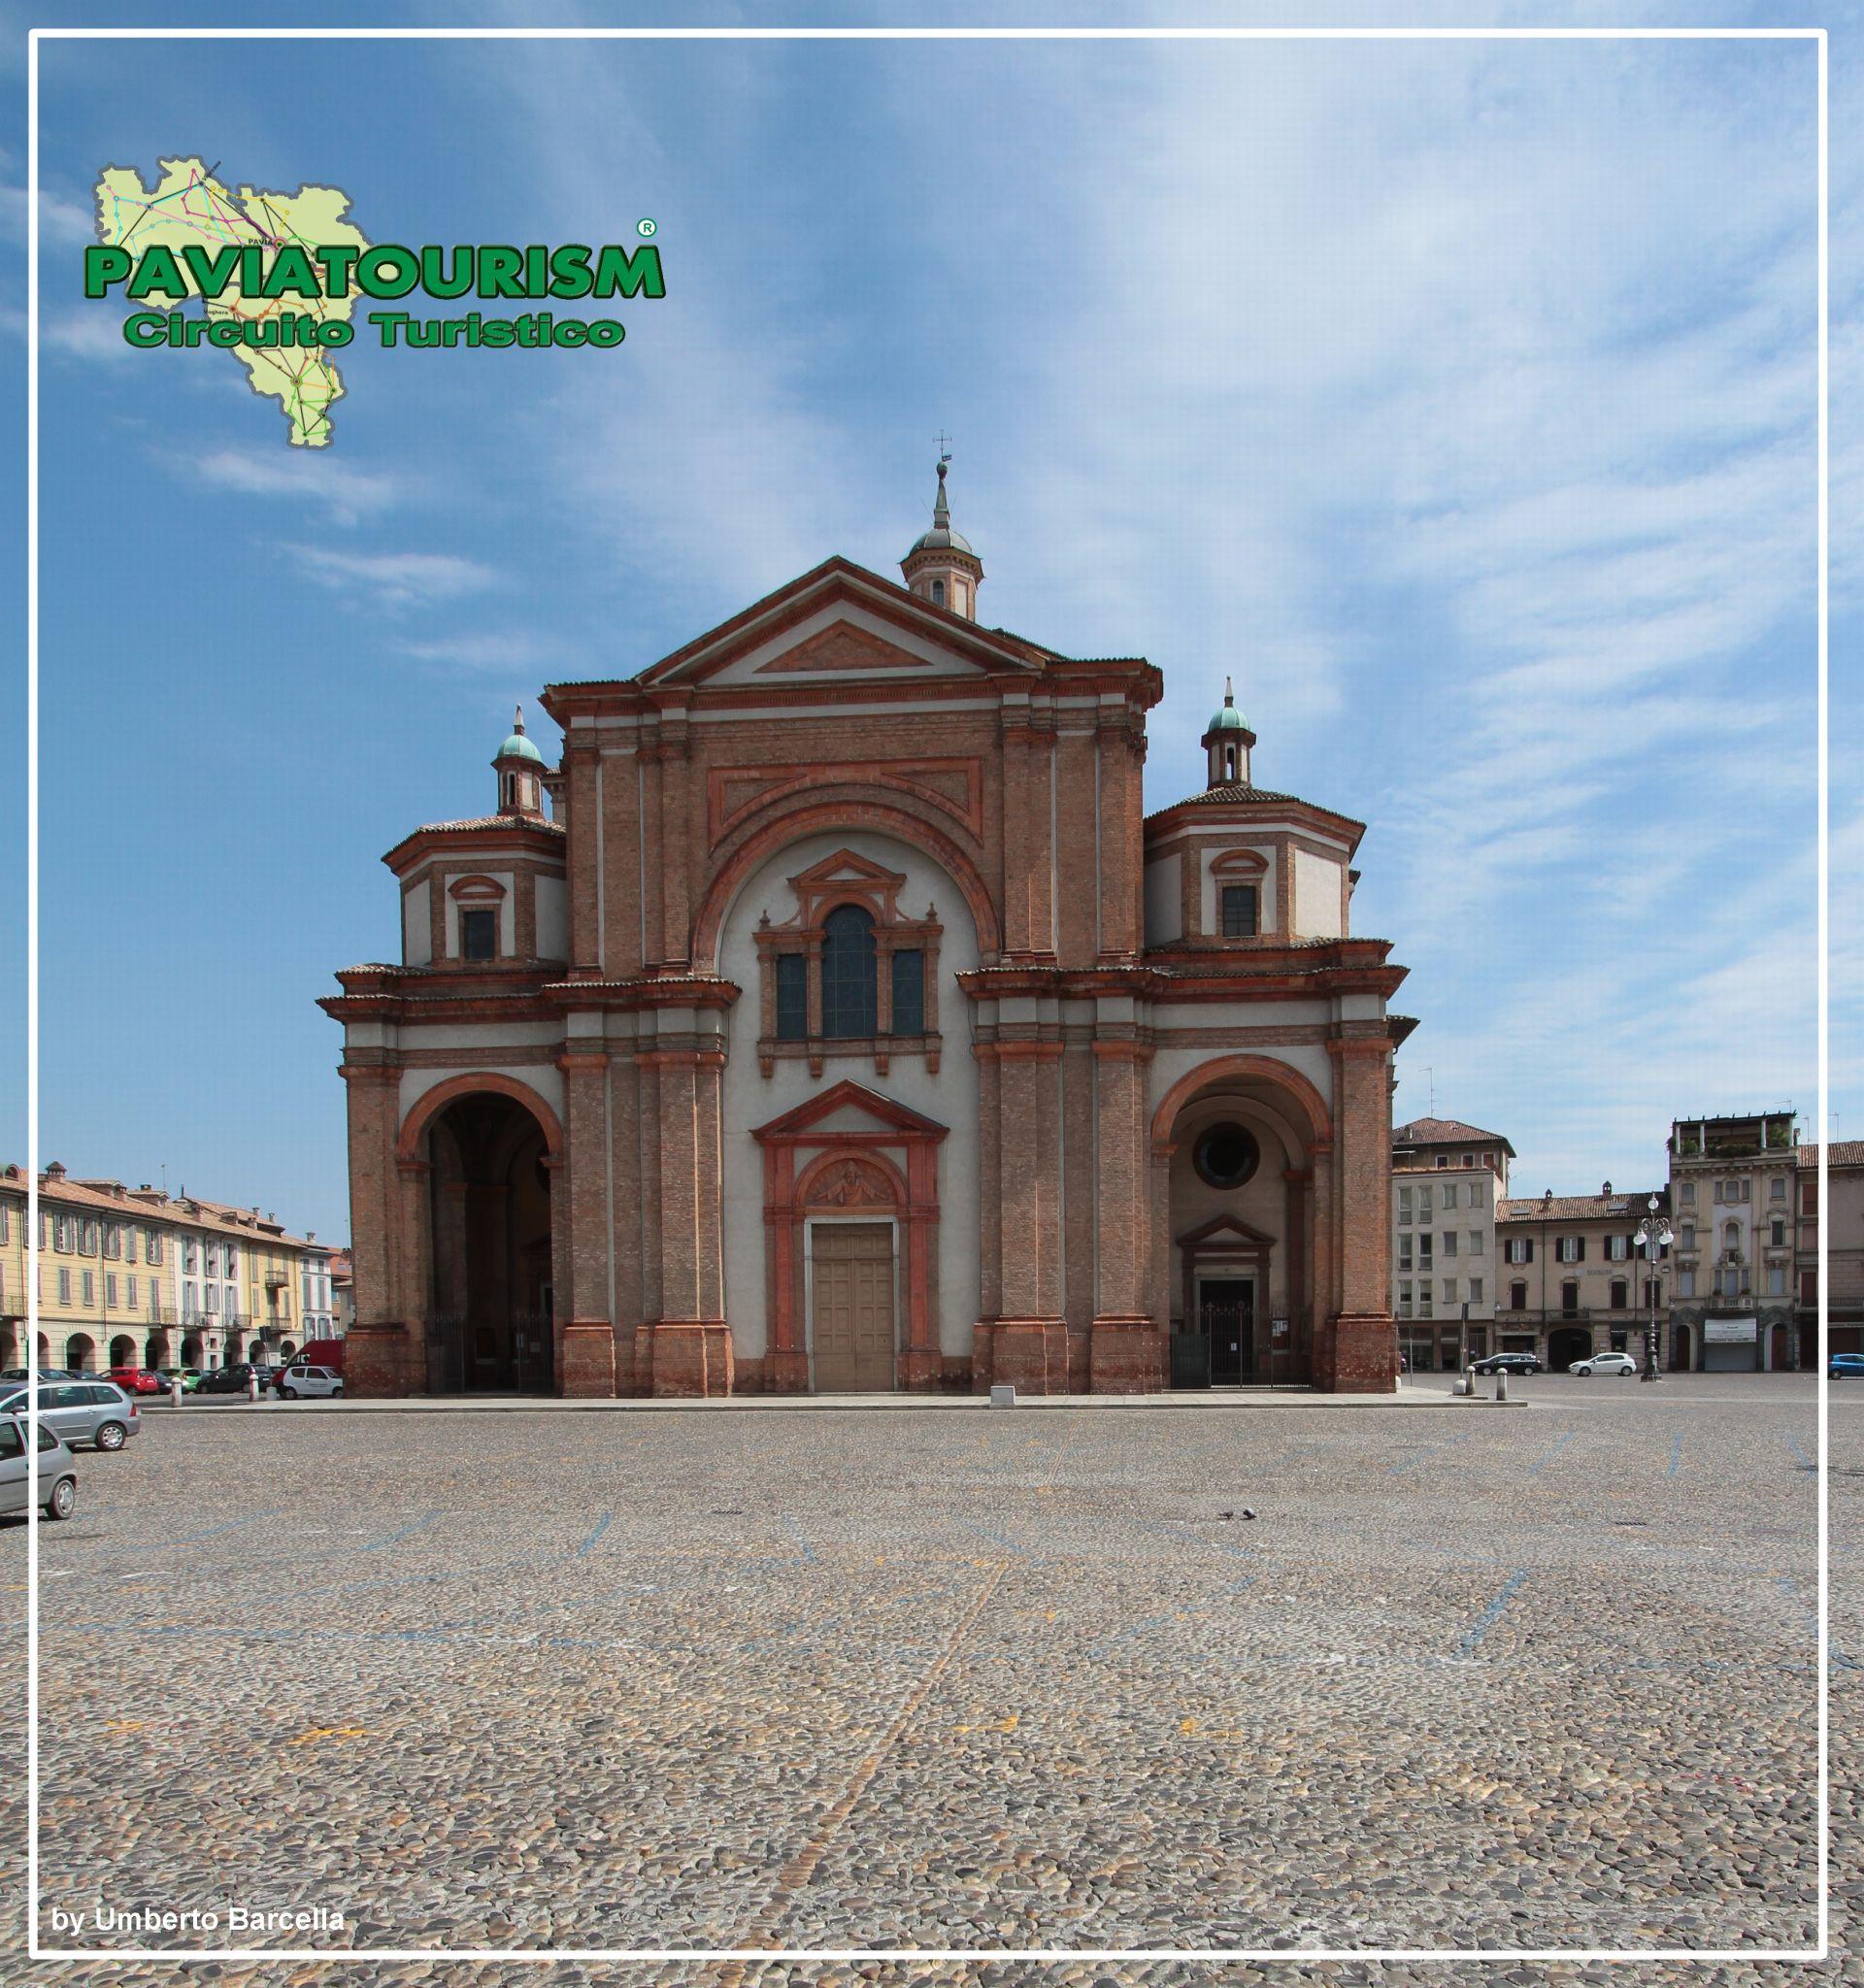 Paviatourism e le leggende vogheresi  Paviatourism